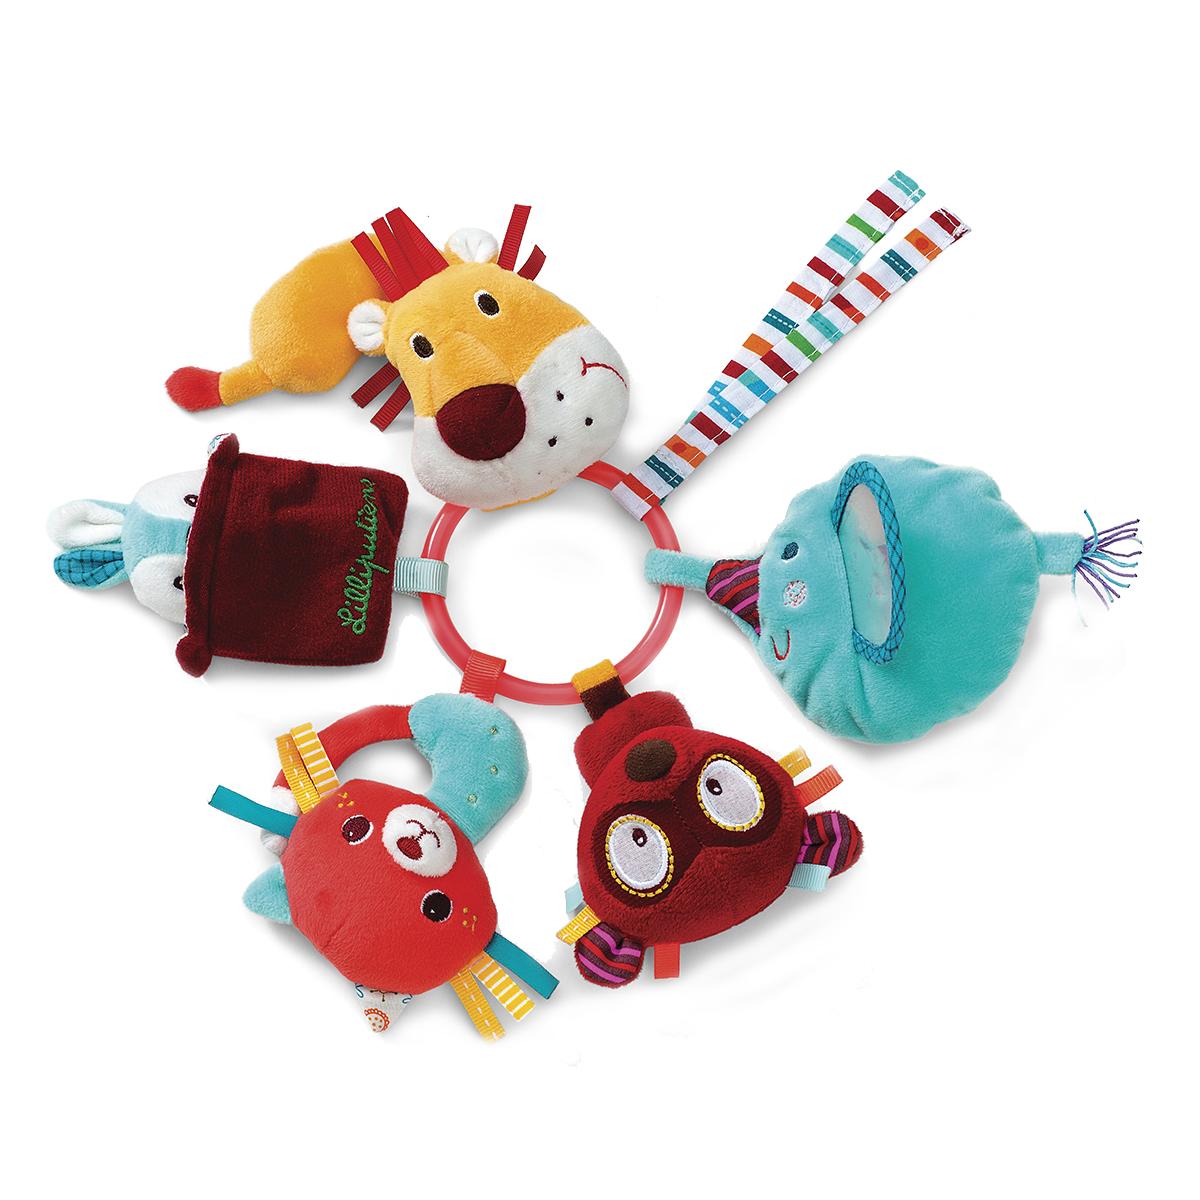 Lilliputiens Кольцо с погремушками Цирк Шапито lilliputiens ферма кольцо с мягкими игрушками